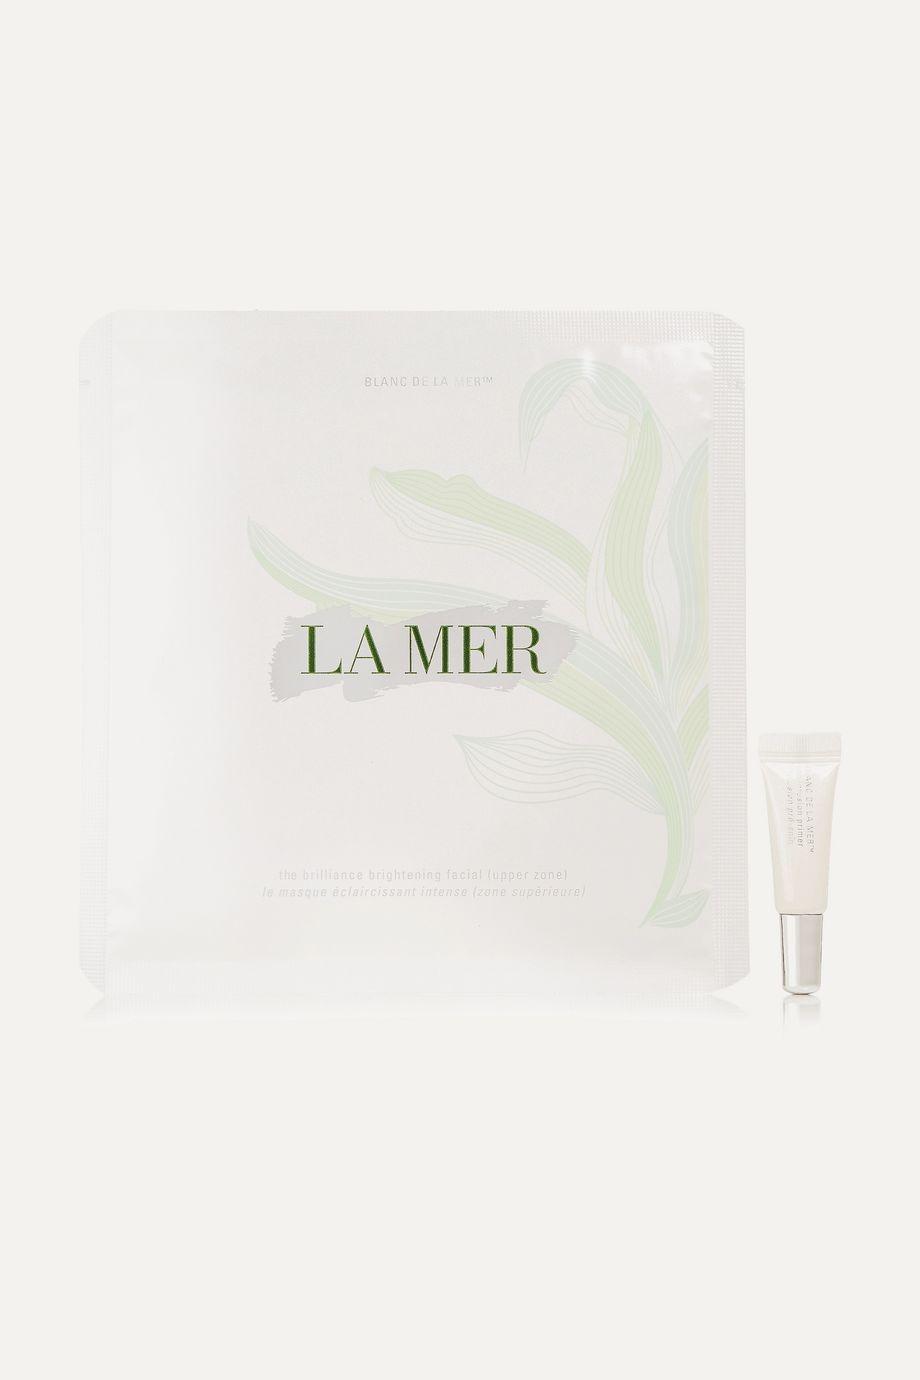 La Mer The Brilliance Brightening Facial x 6